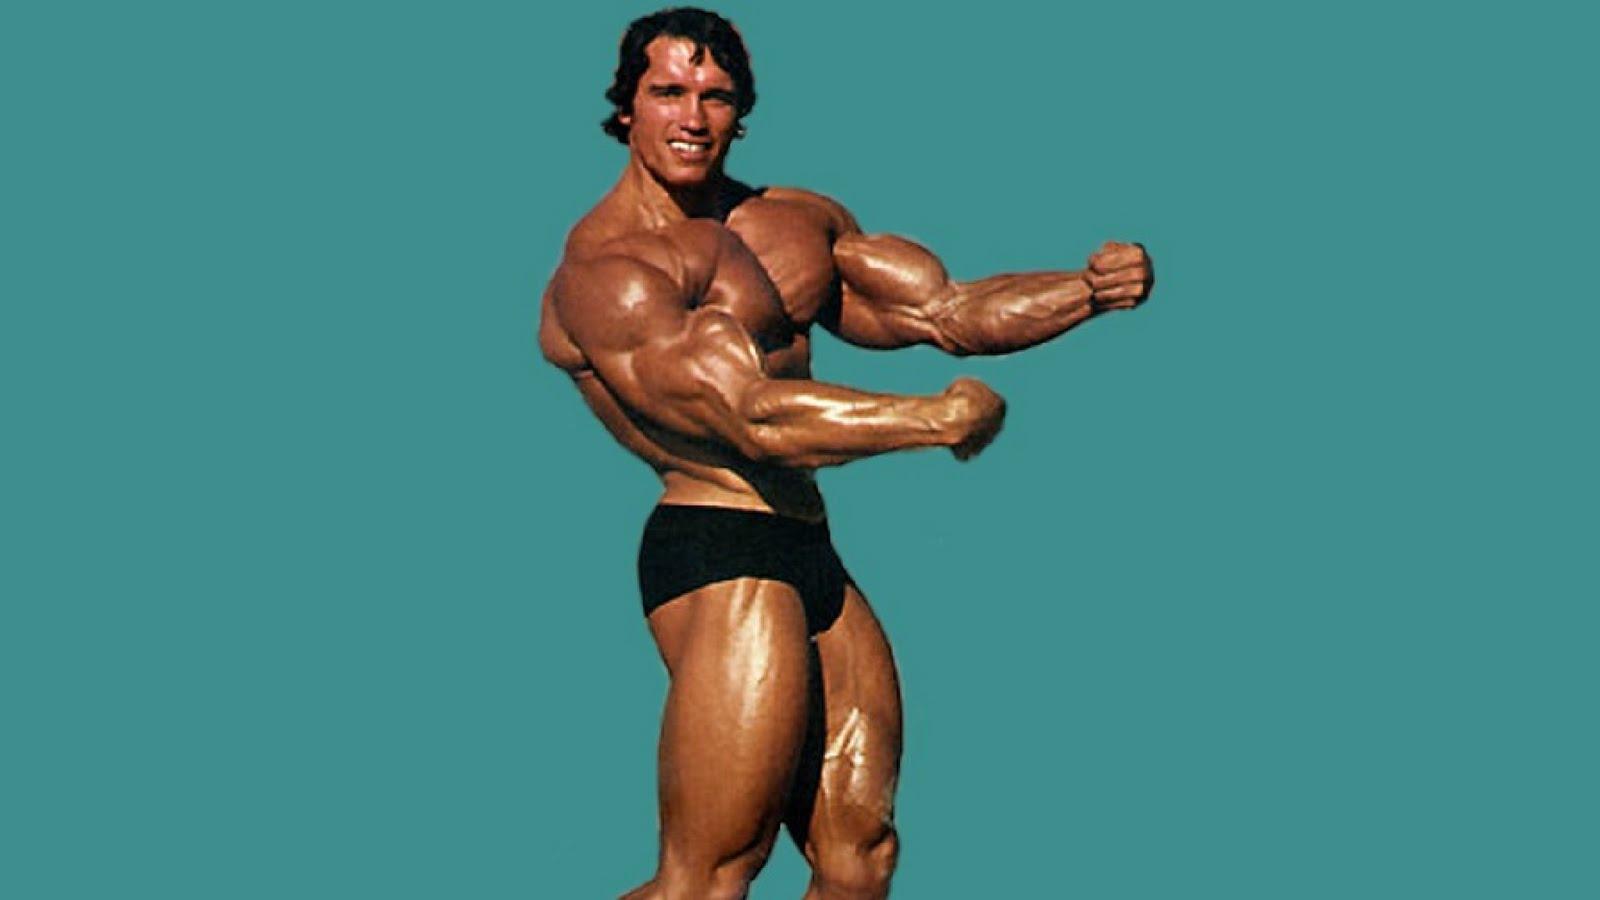 Arnold schwarzenegger bodybuilding pictures arnold schwarzenegger